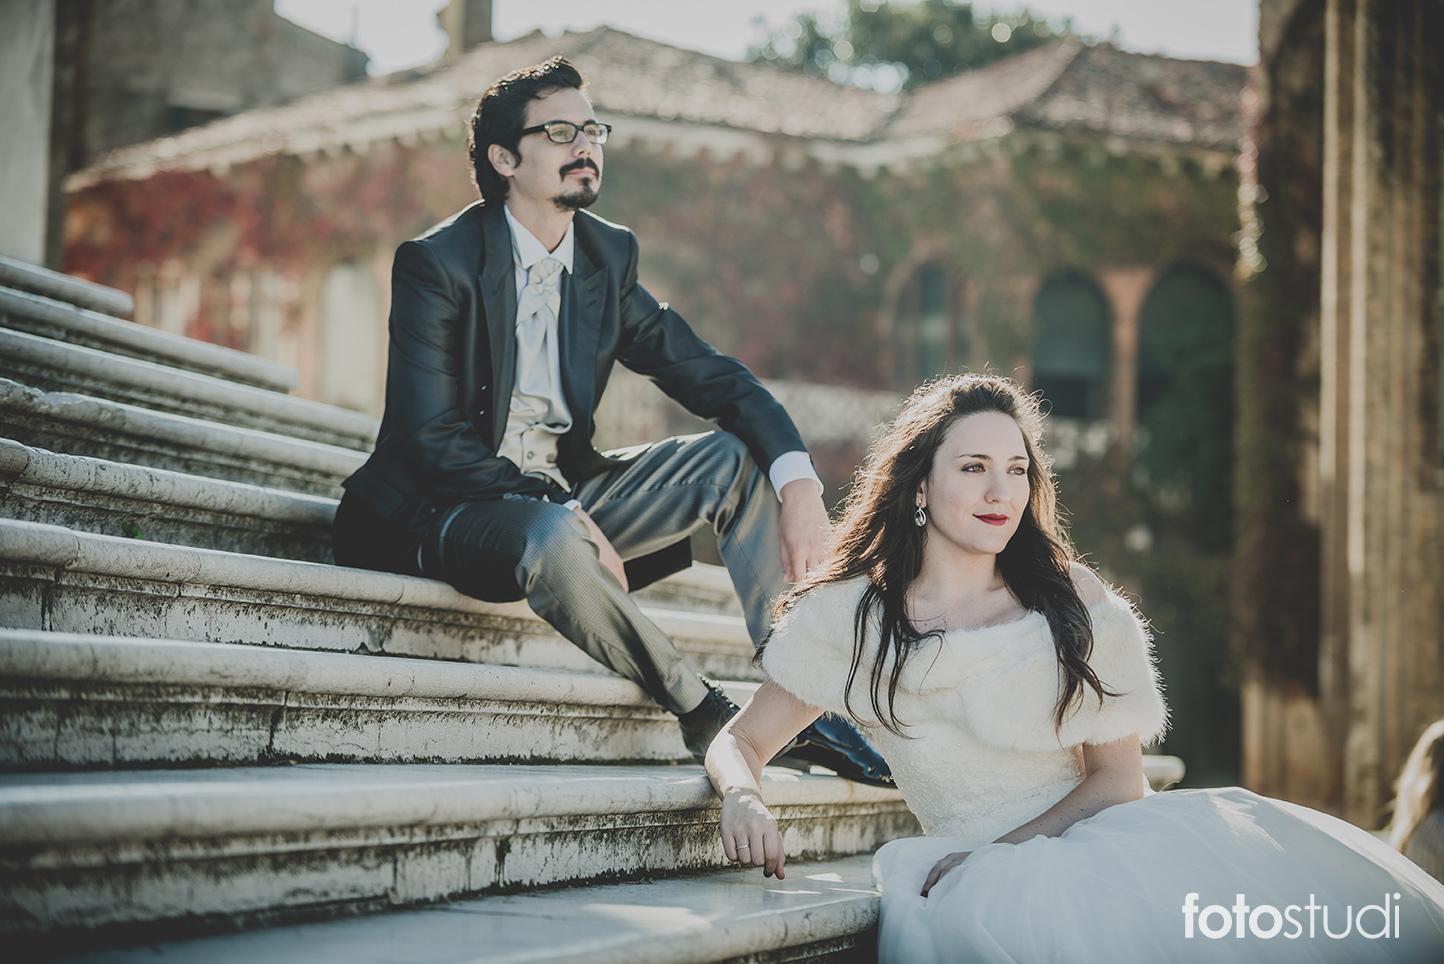 postboda-venecia-fotostudi512